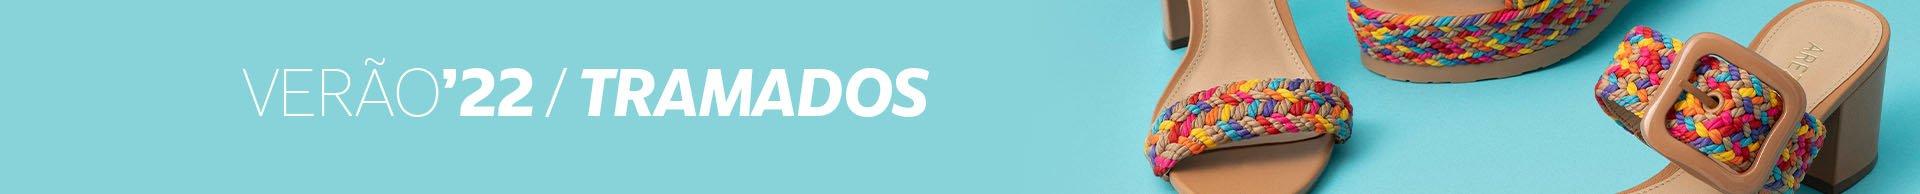 Banners-Tramados-categoria-desktop.jpg